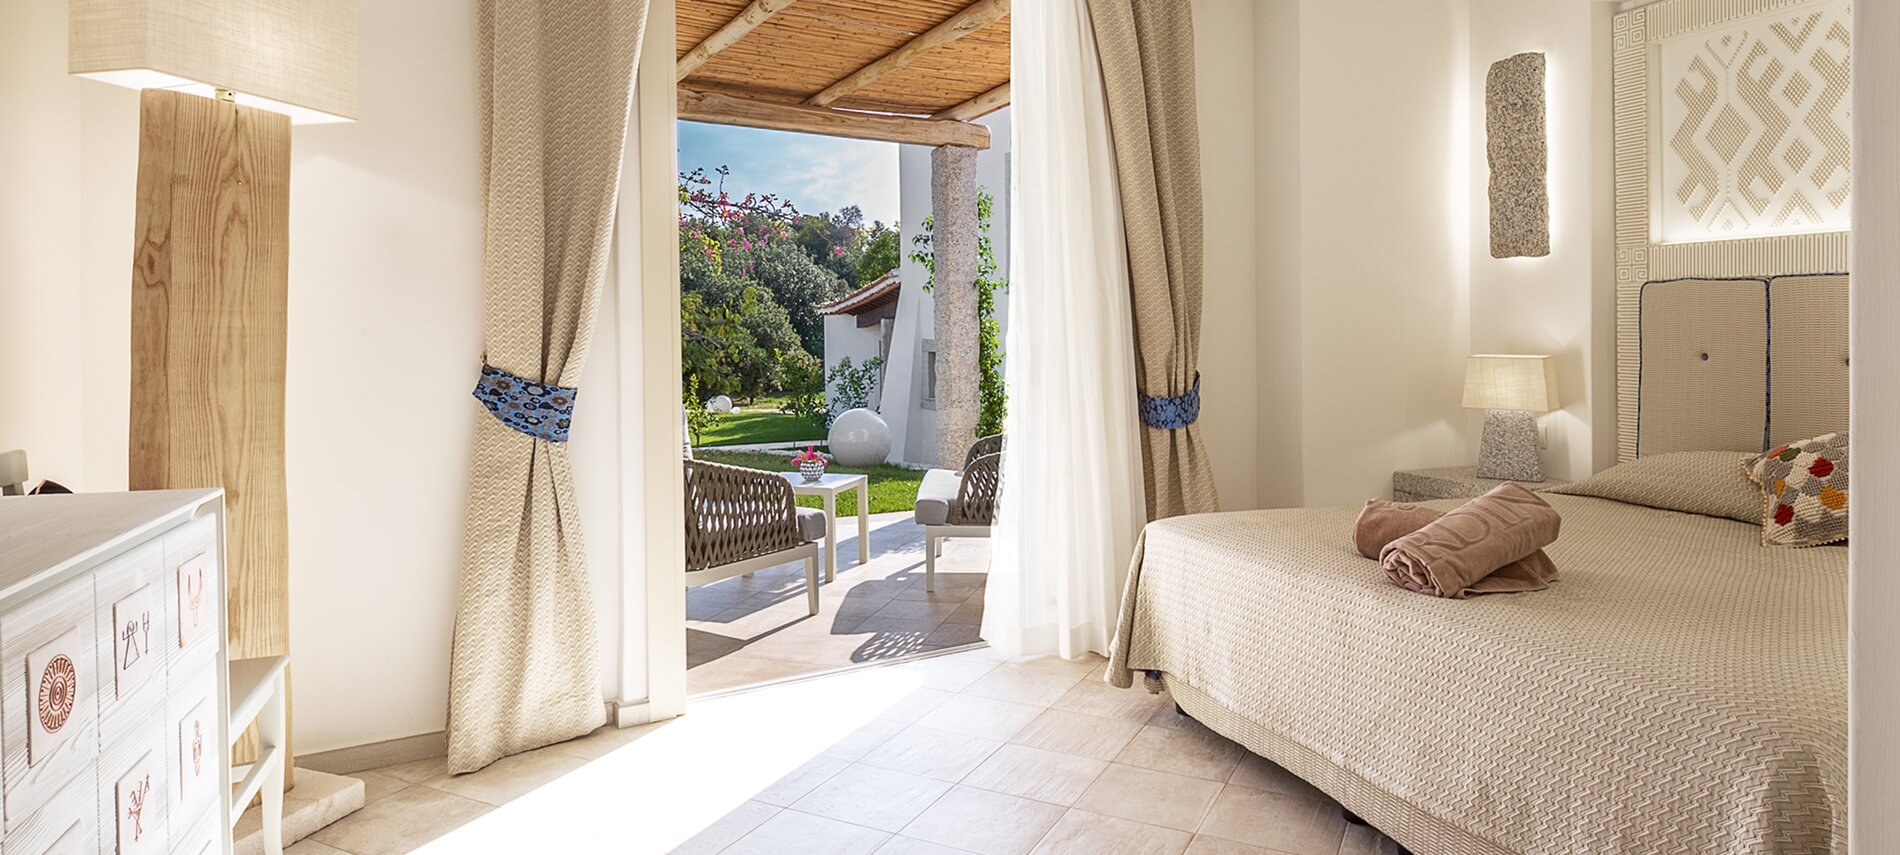 experience_hotel_con_piscina_sardegna